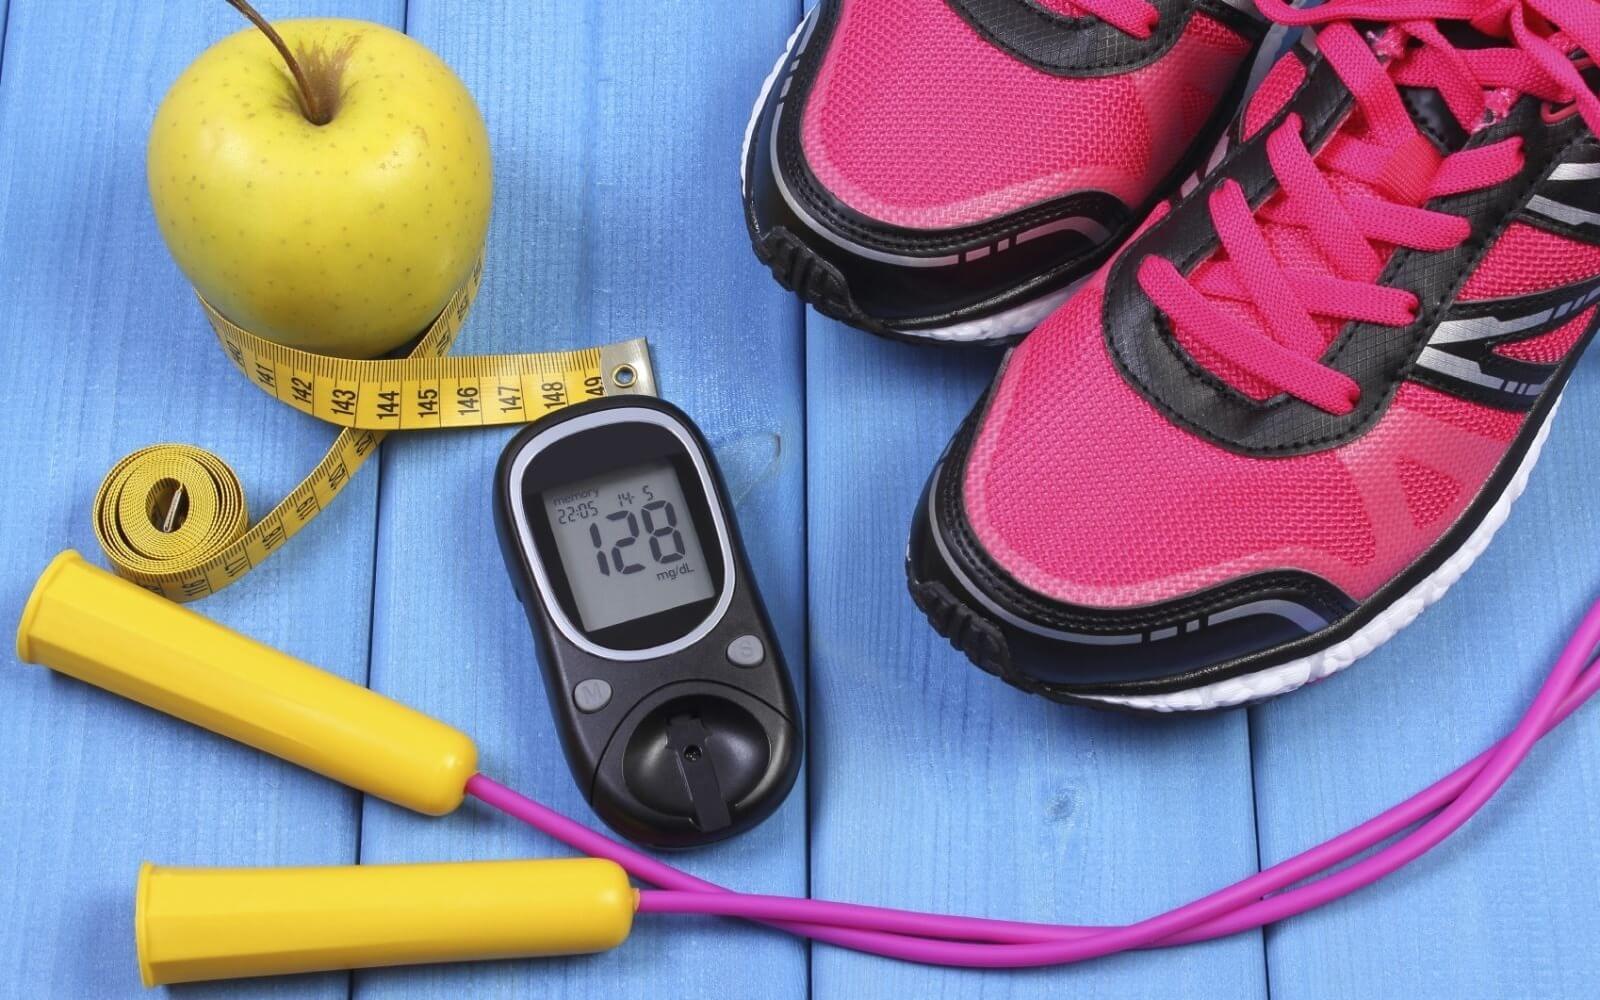 5 Kebiasaan yang Dapat Memperburuk Diabetes